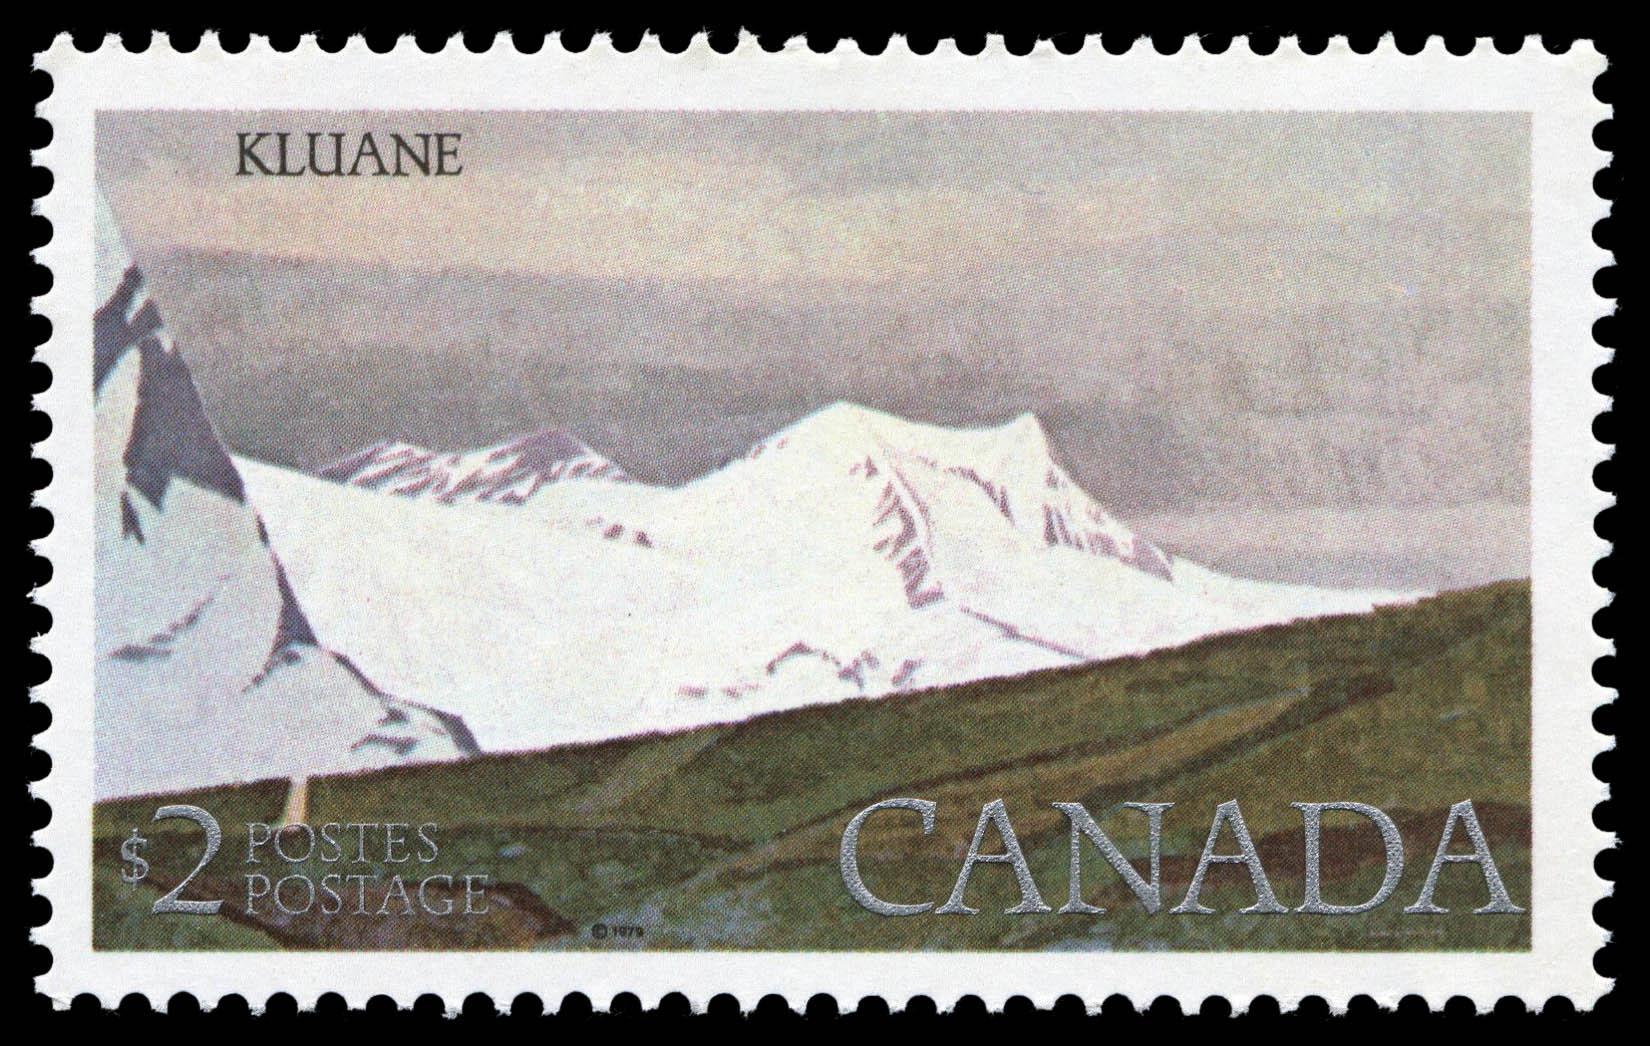 Kluane Canada Postage Stamp